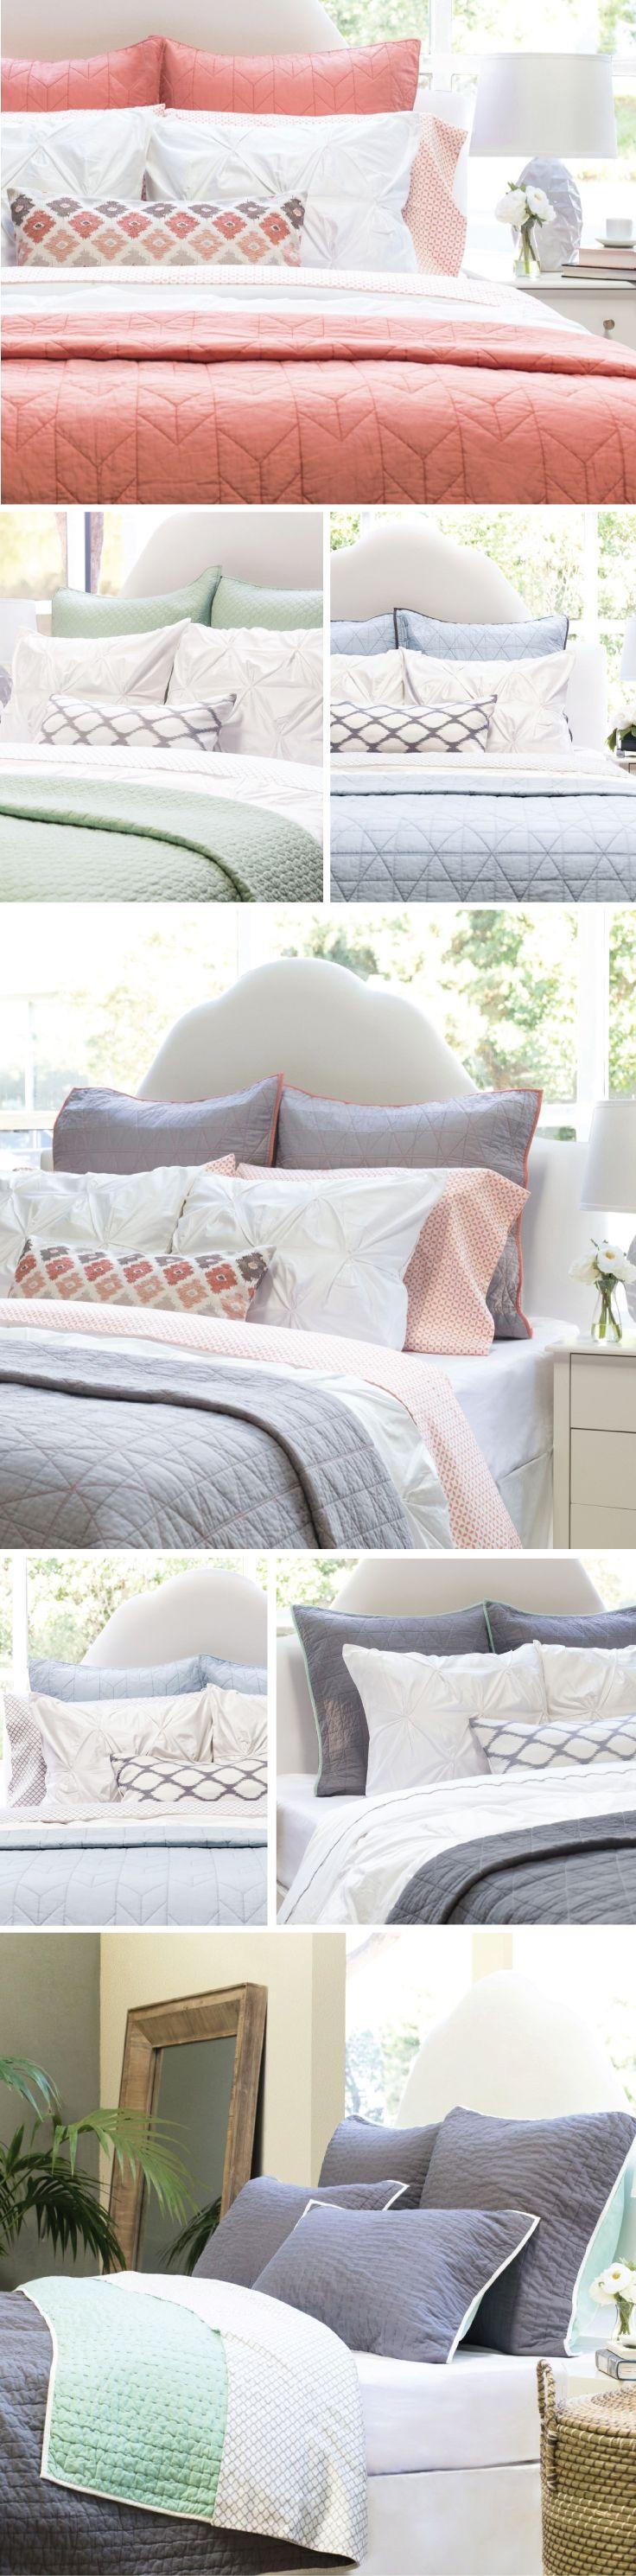 best bedding images on pinterest bedroom ideas master bedrooms